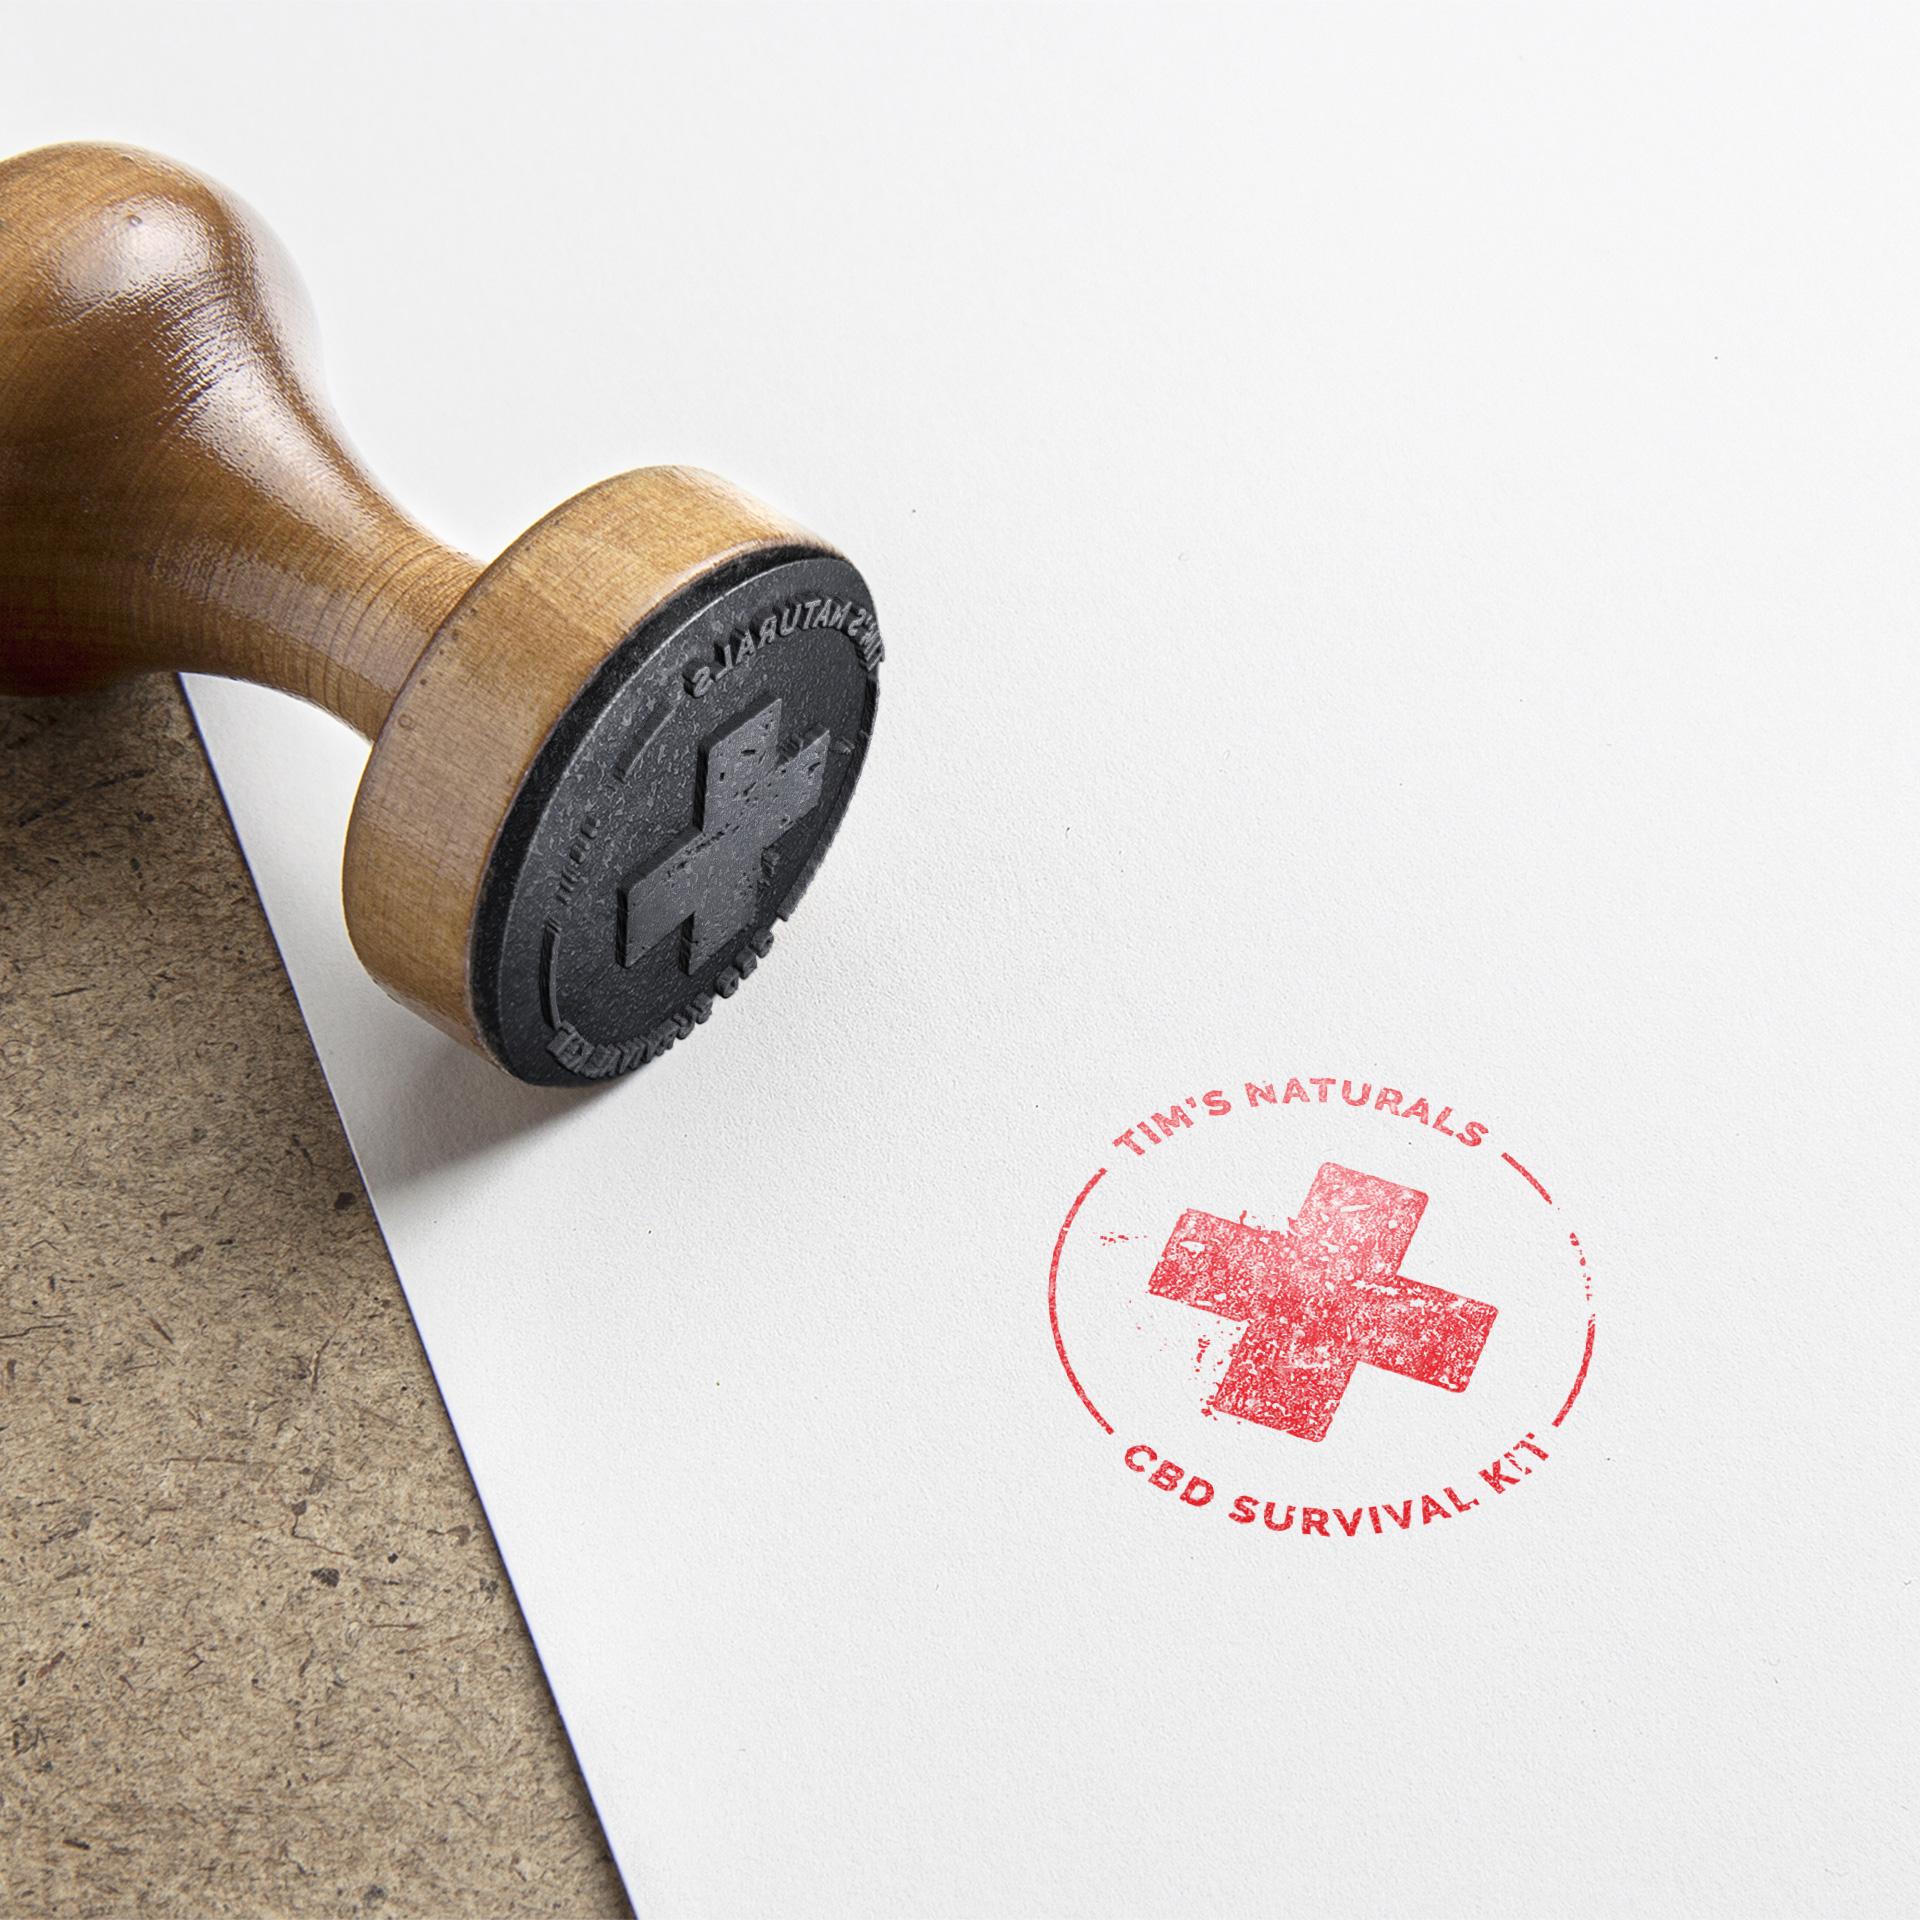 tims-naturals-rubber-stamp-cbd-survival-kit.jpg